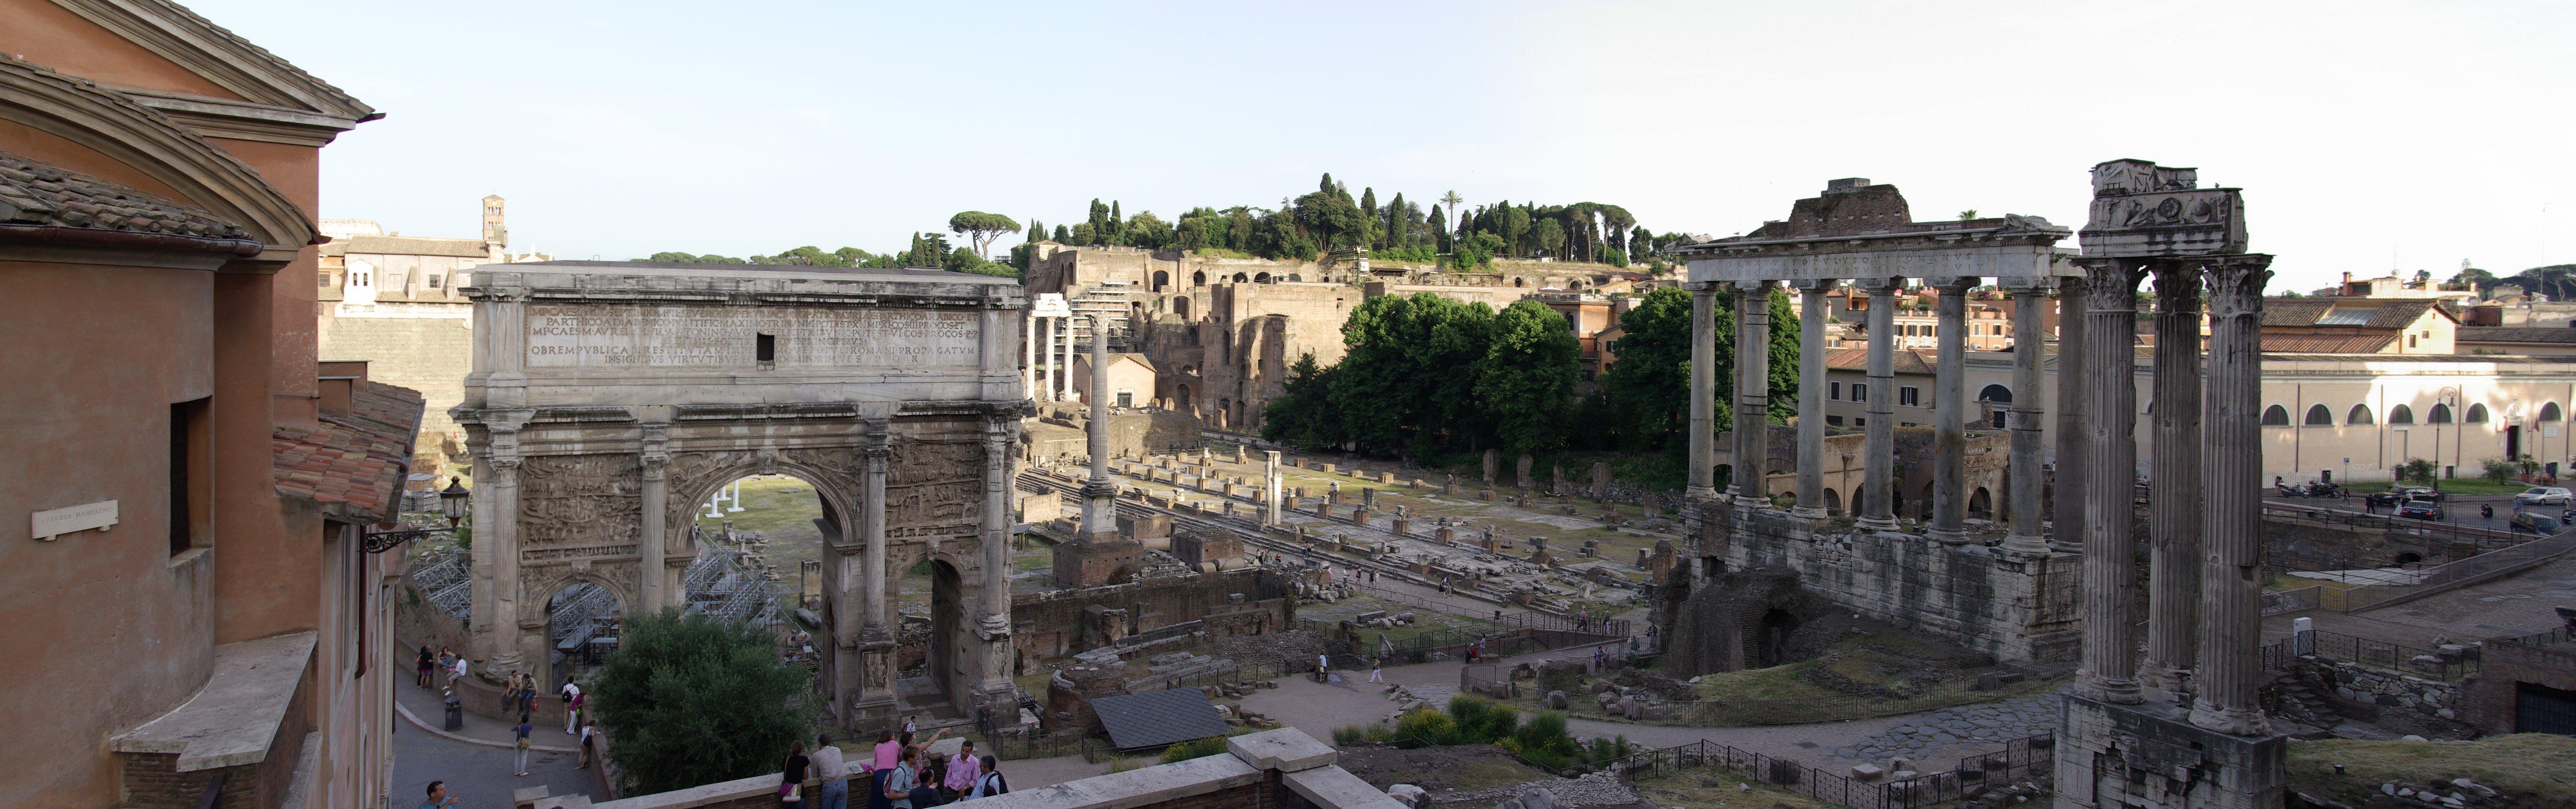 Description Roma Foro Romano Panorama 001.JPG